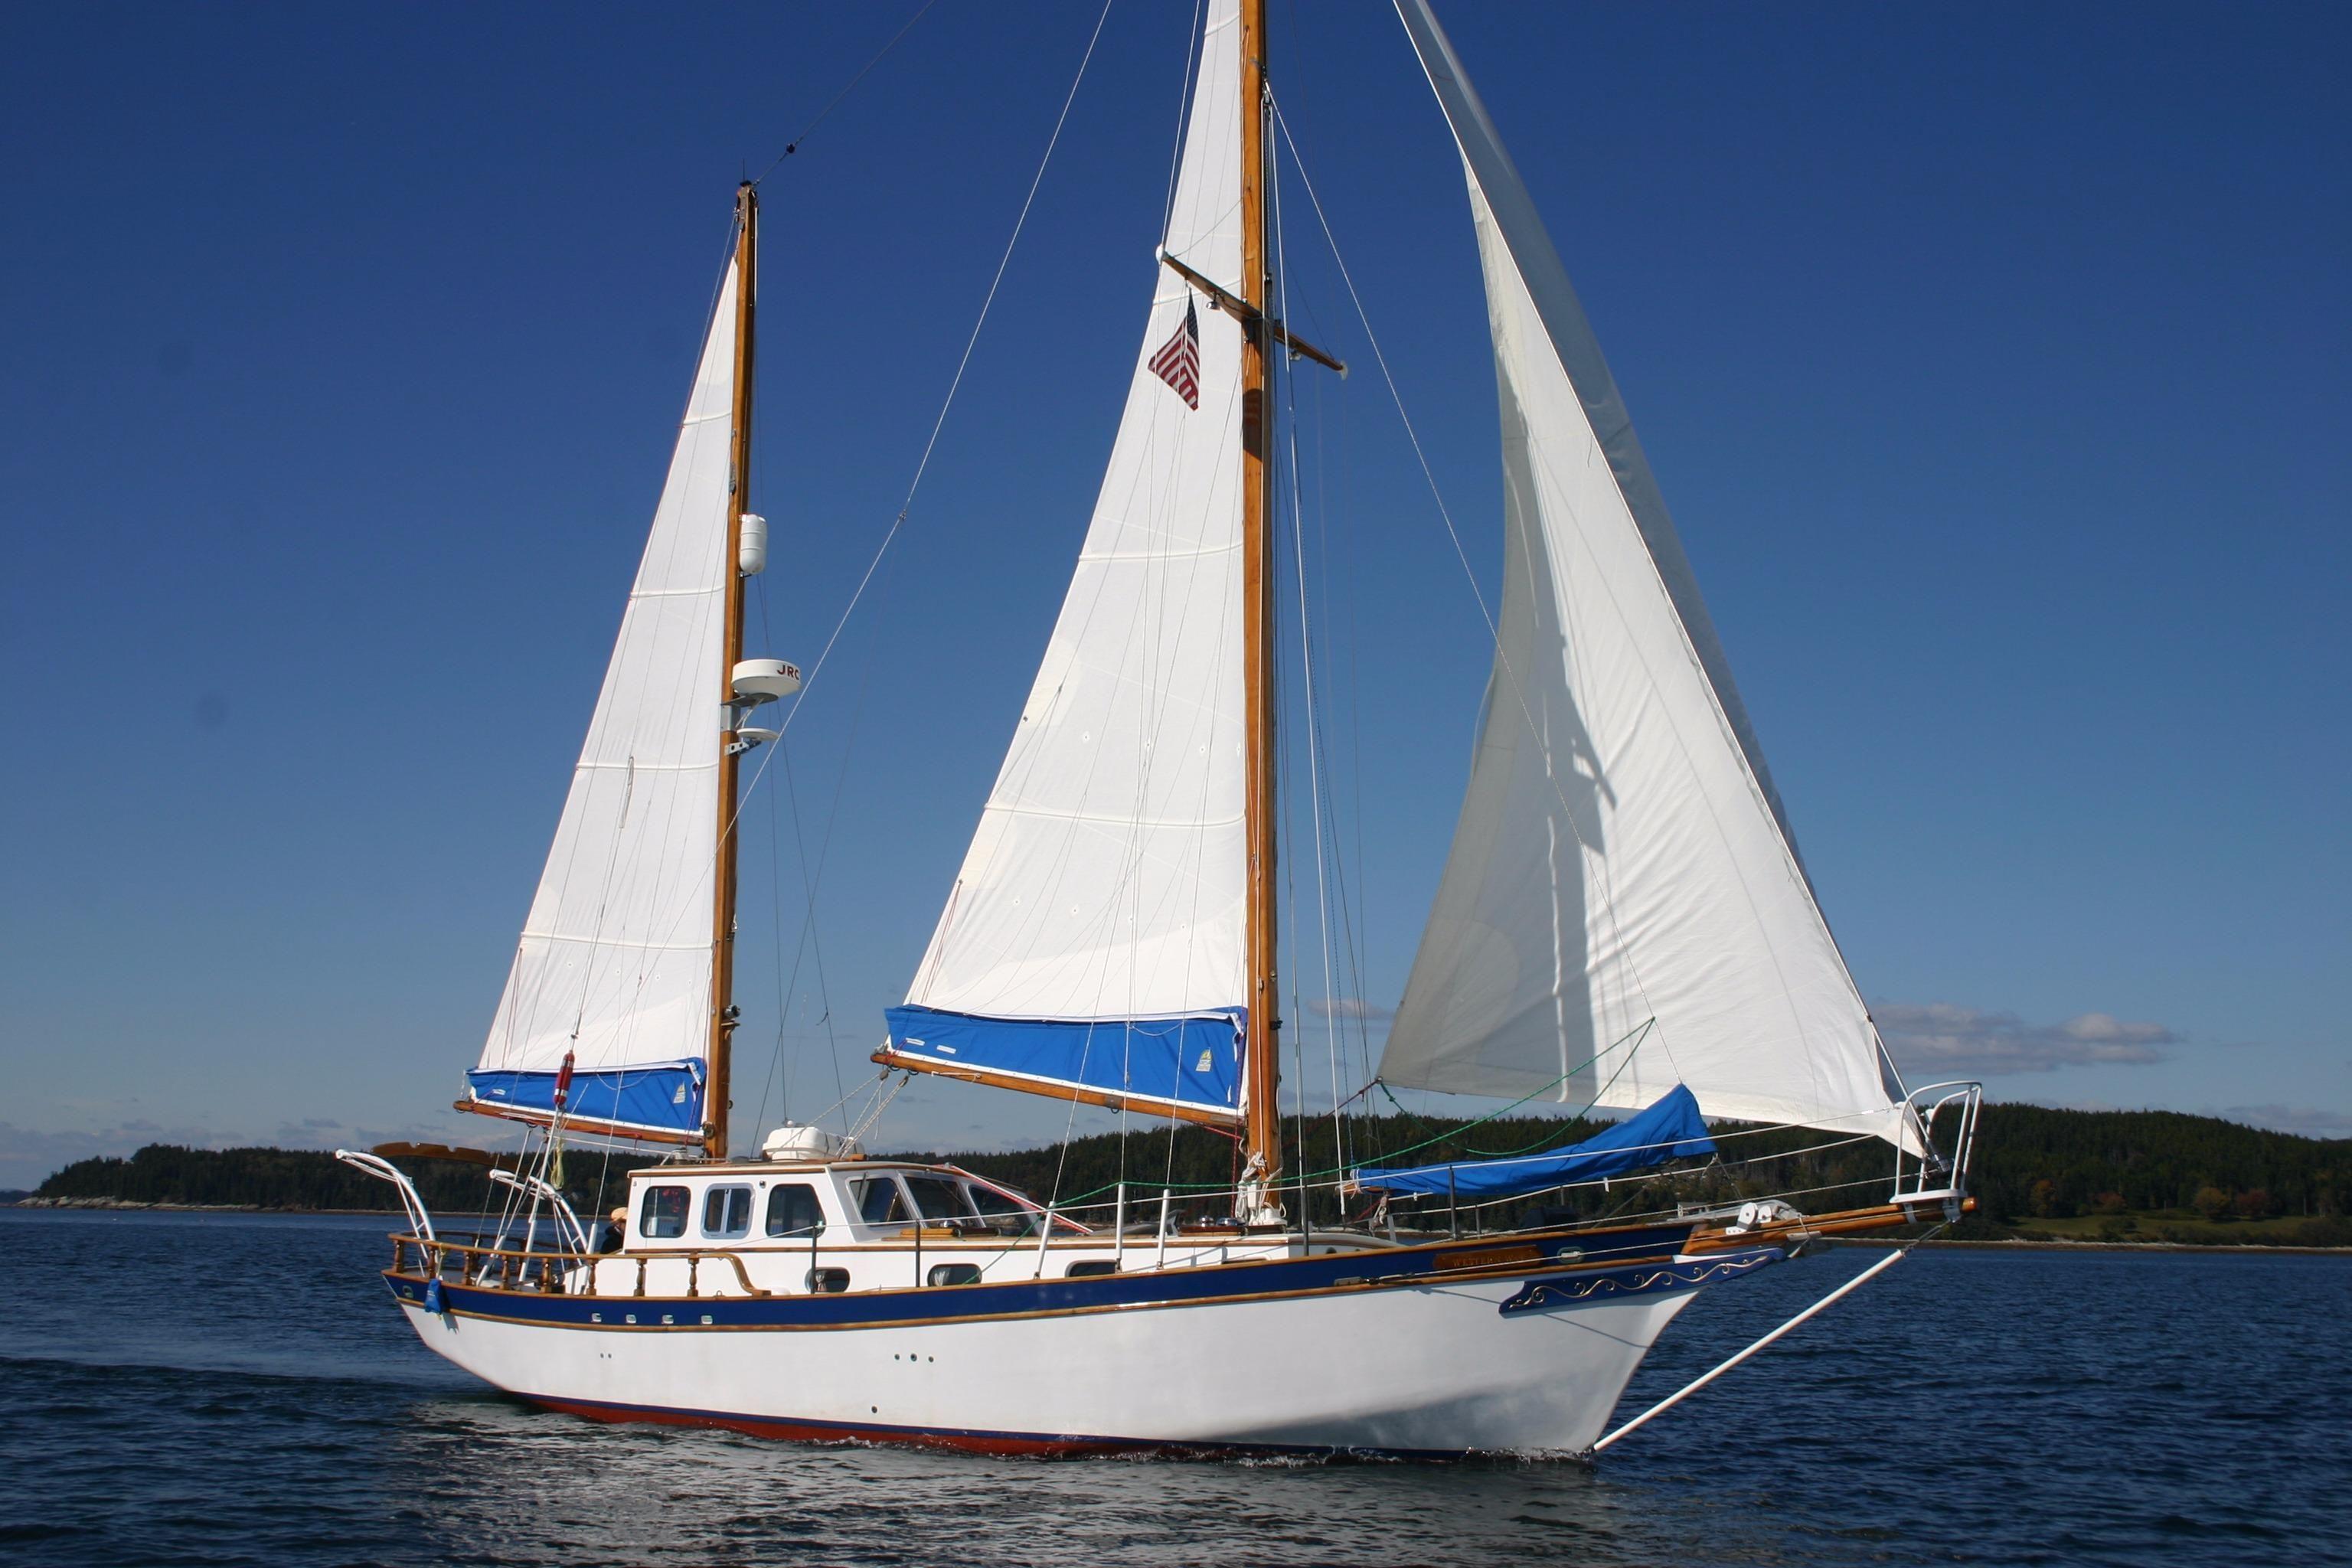 World Cat Boats For Sale >> 1961 Akerman Newporter 40 Ketch Sail Boat For Sale - www ...